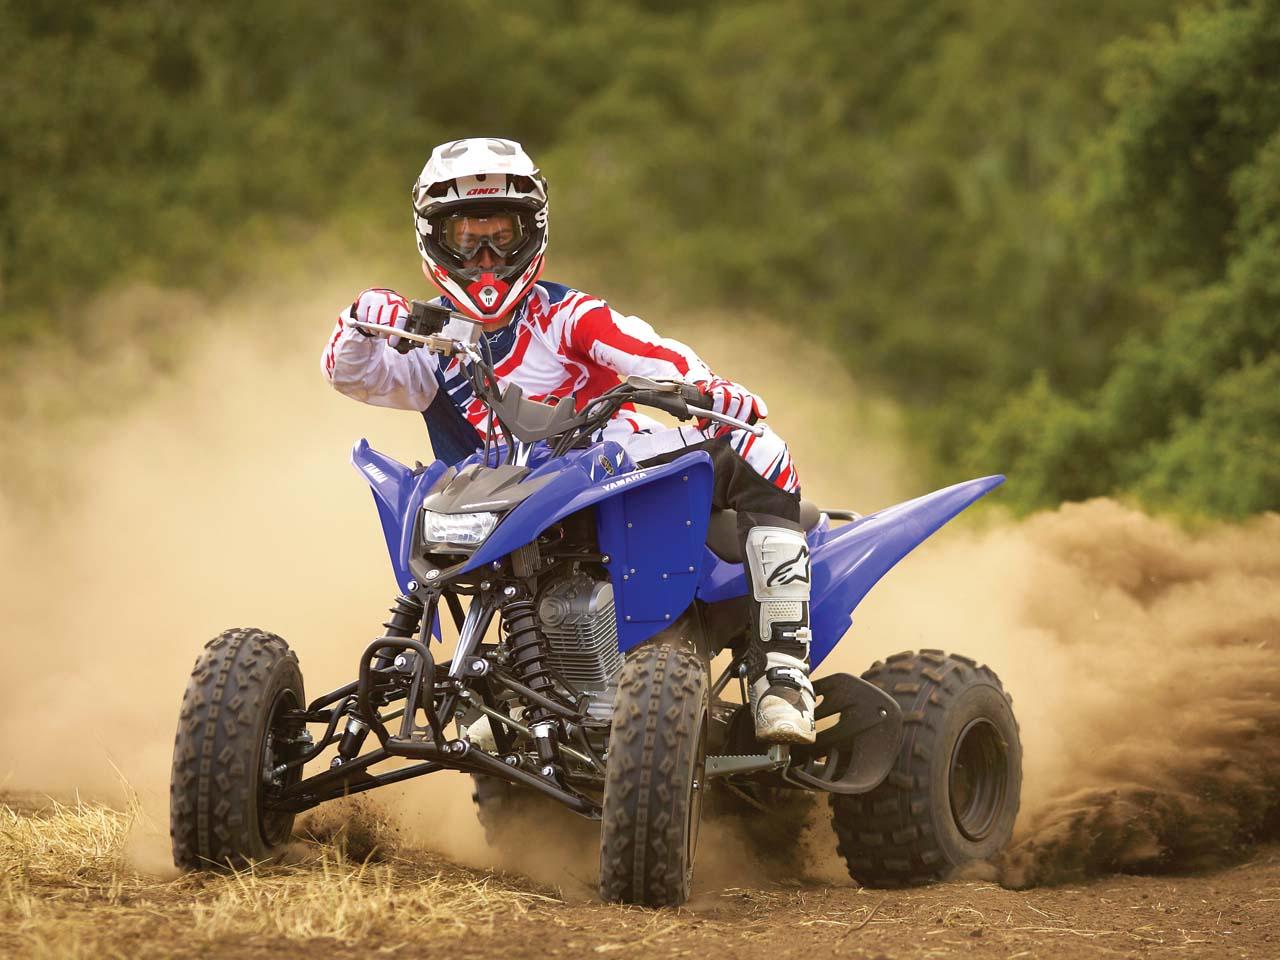 2011.yamaha.raptor125.blue_.front_.riding.on-dirt.jpg